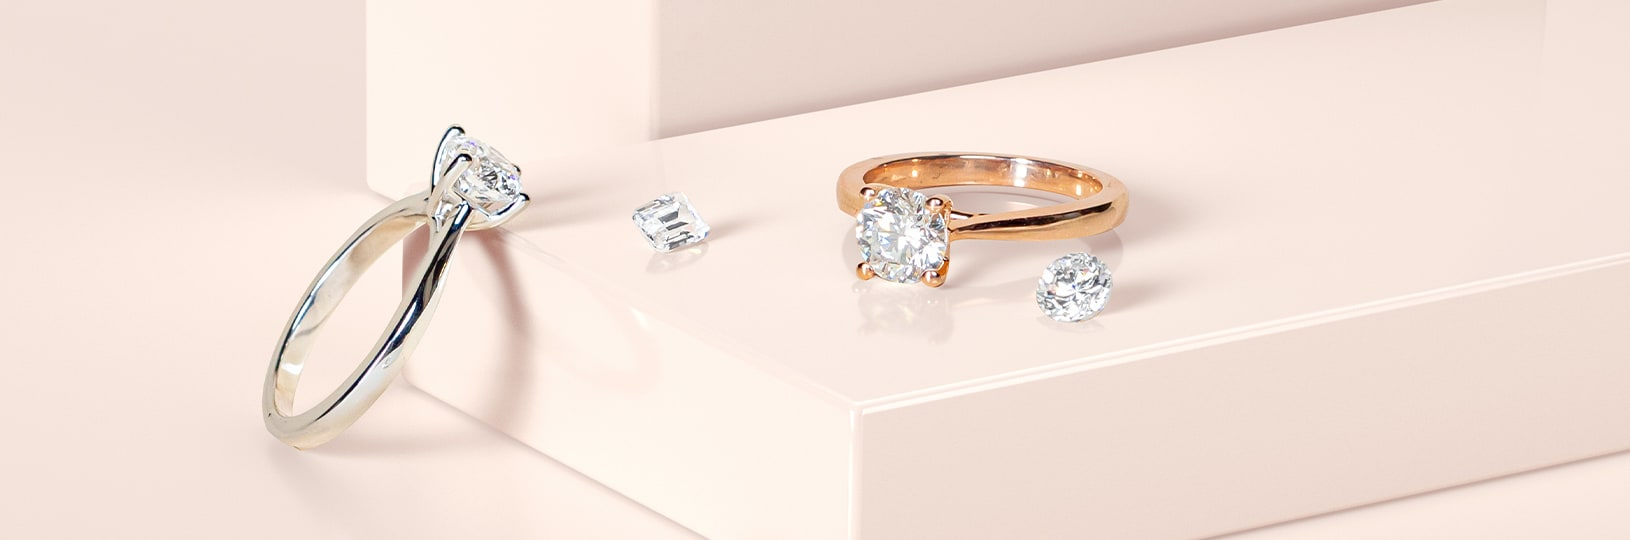 Two lab diamond engagement rings